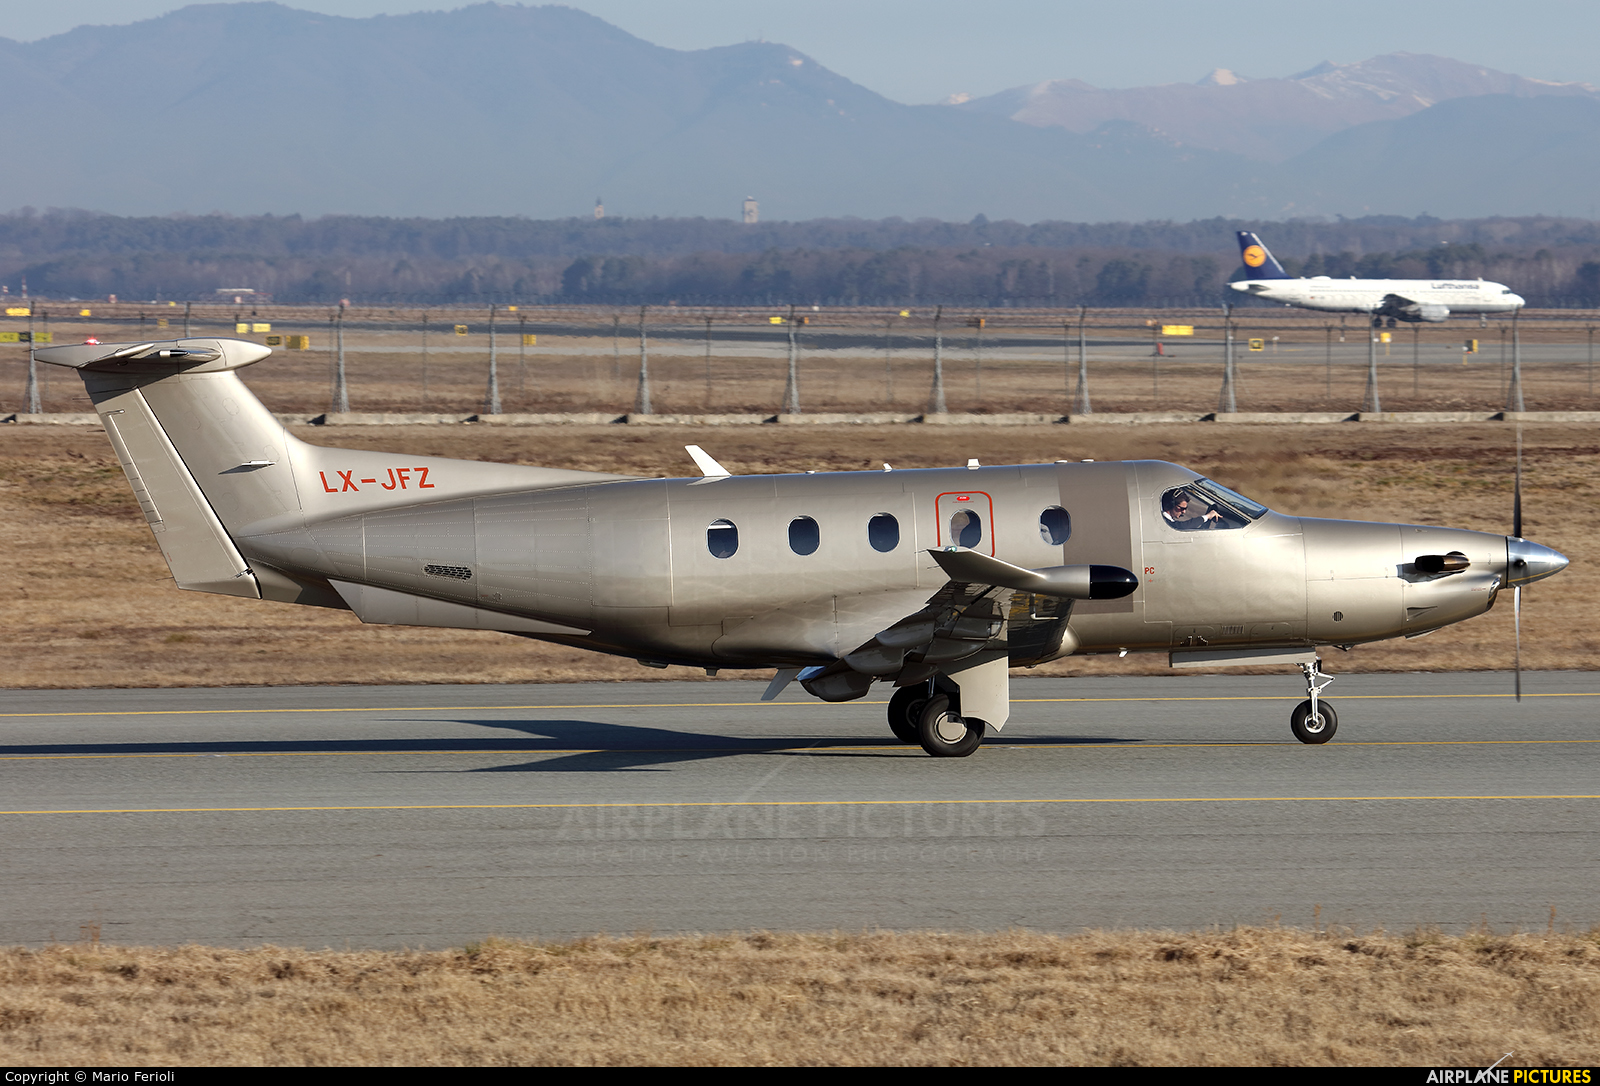 Jetfly Aviation LX-JFZ aircraft at Milan - Malpensa